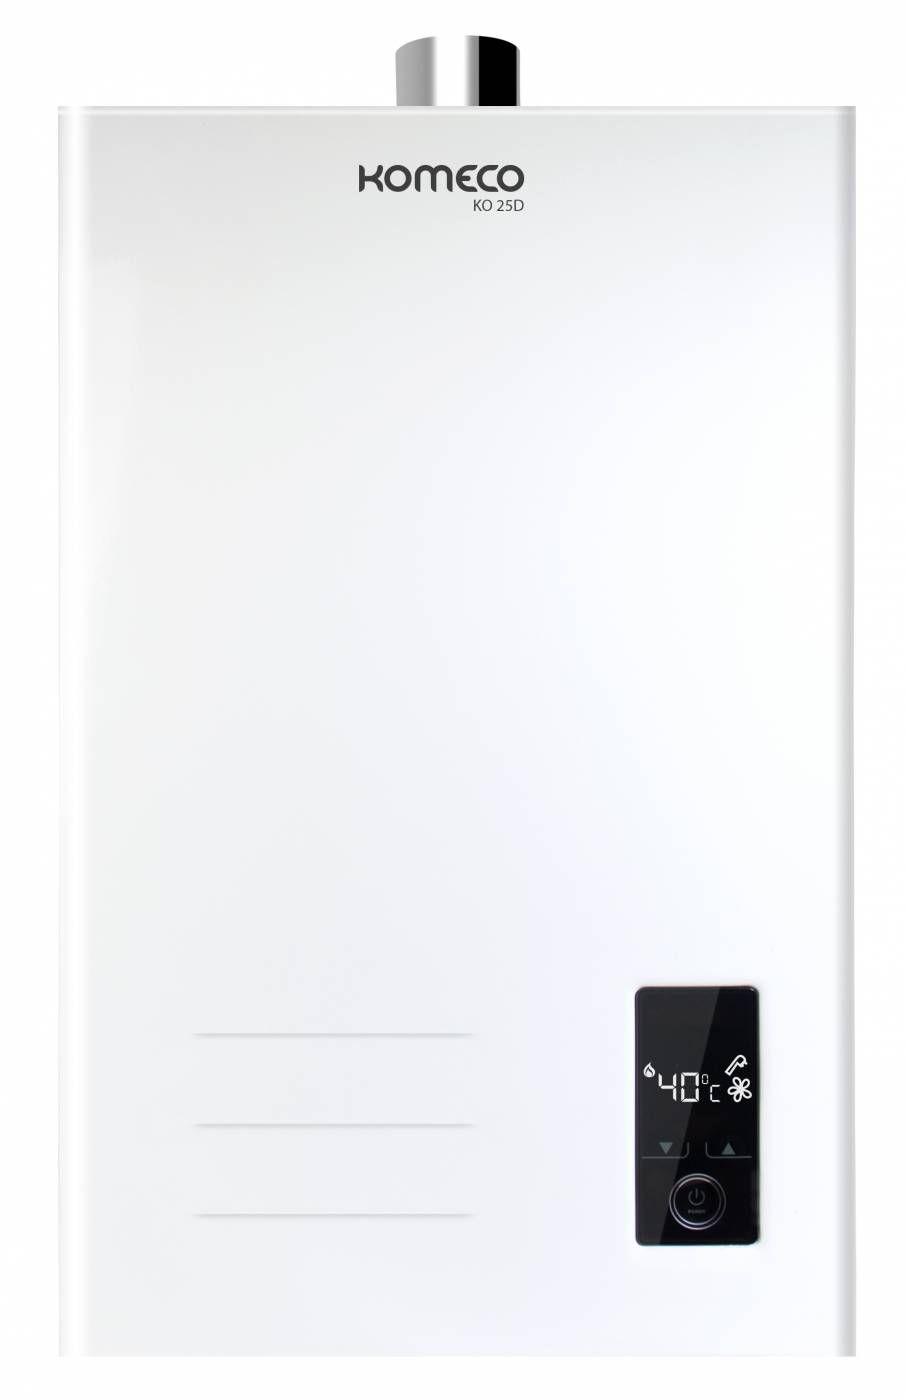 Aquecedor a Gás Komeco KO25D branco gás natural